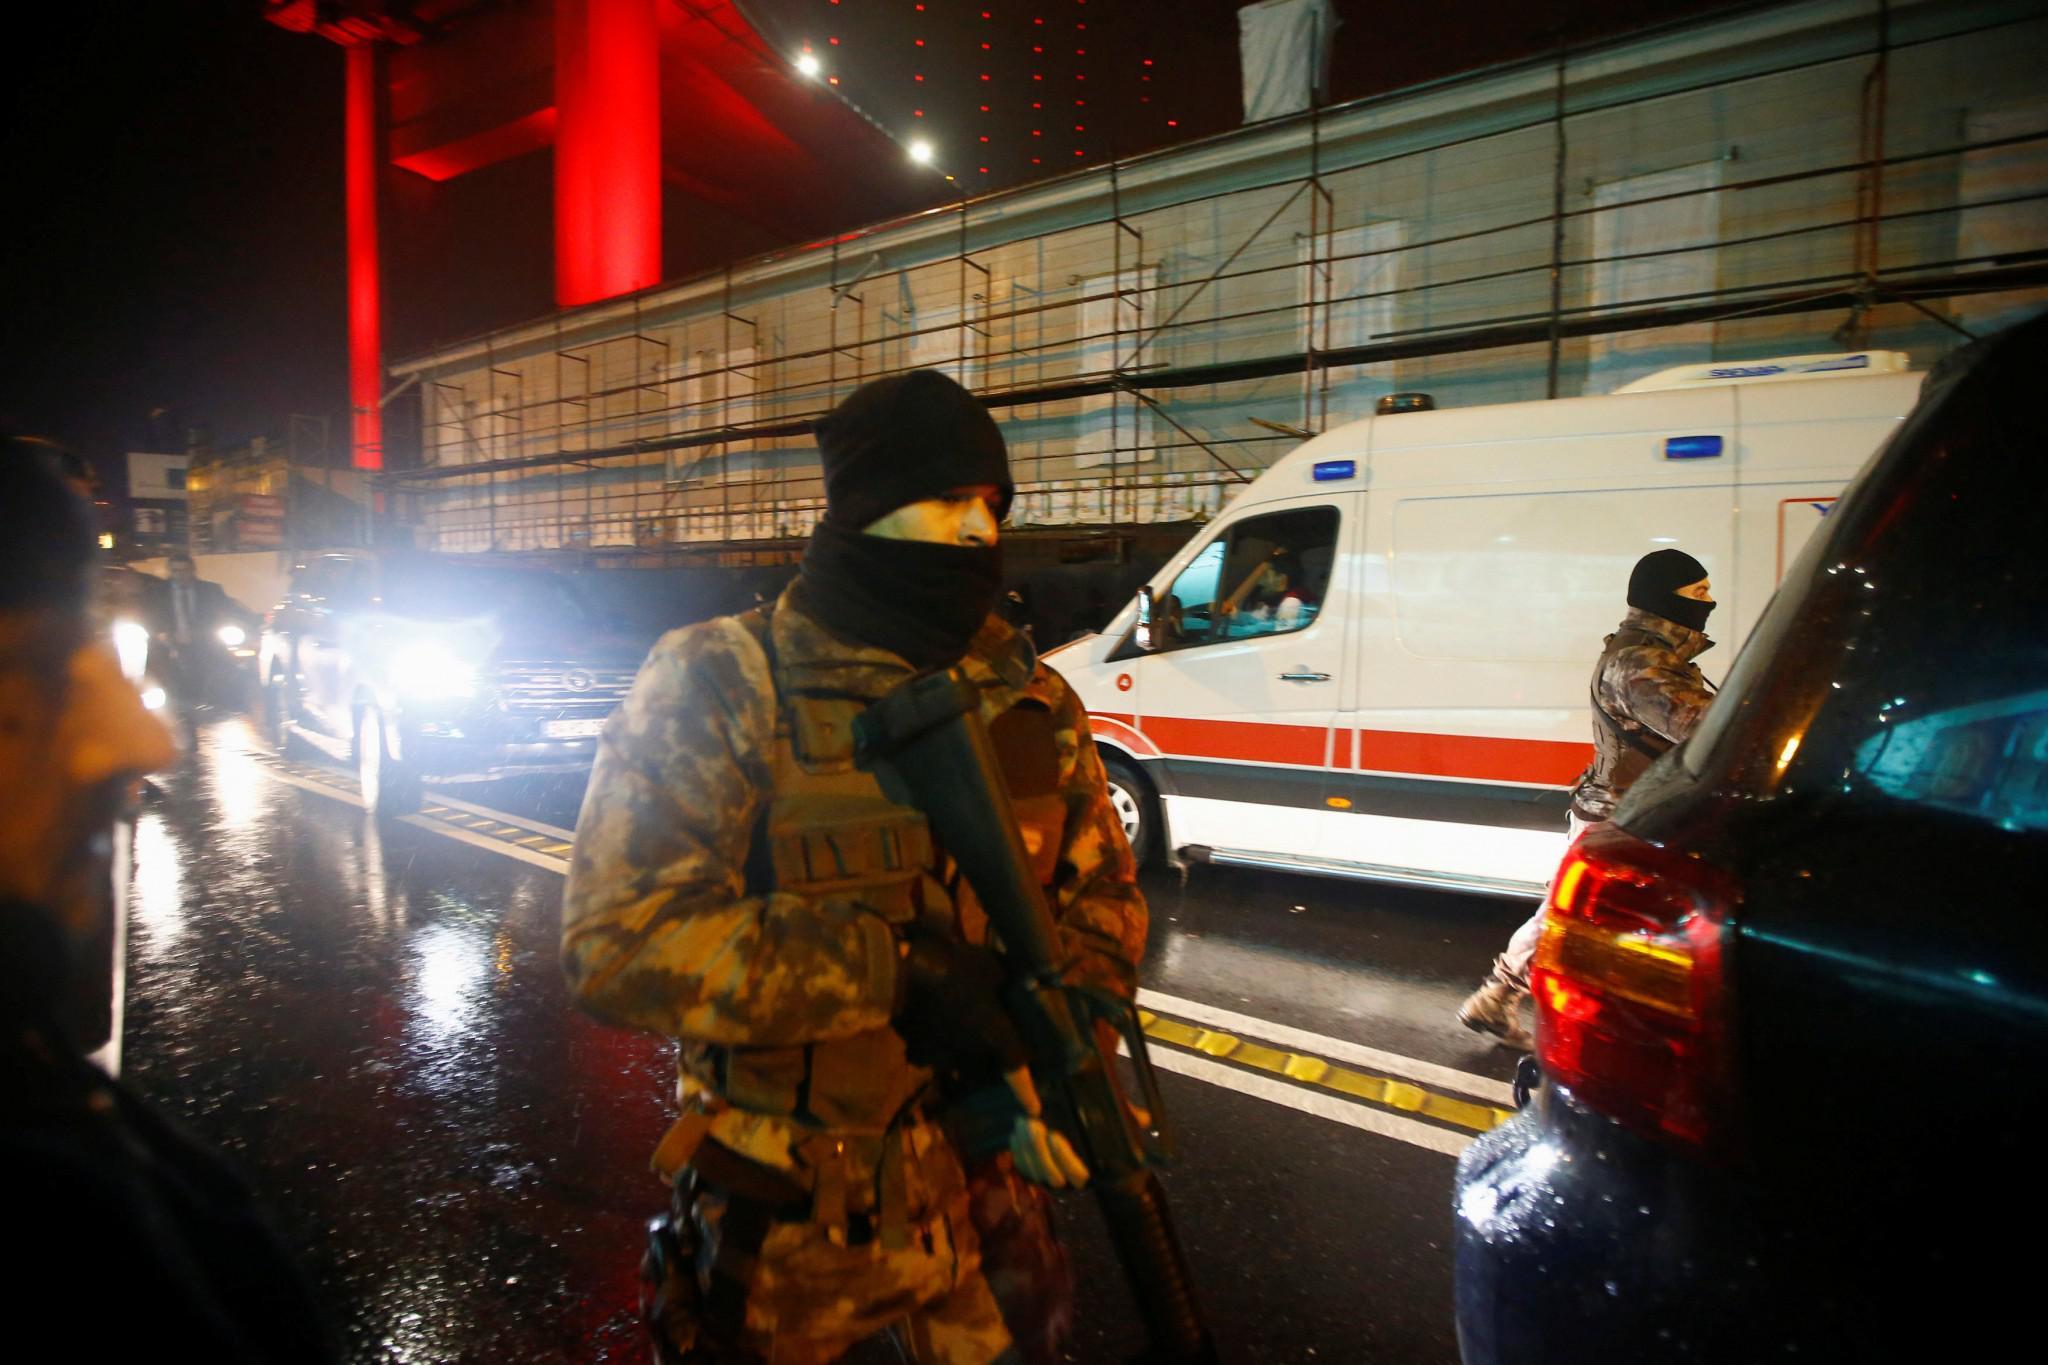 tourkia-epithesi-klamp-nekroi-5 Έτσι σκόρπισε τον θάνατο ο μακελάρης της Κωνσταντινούπολης [εικόνες & βίντεο]